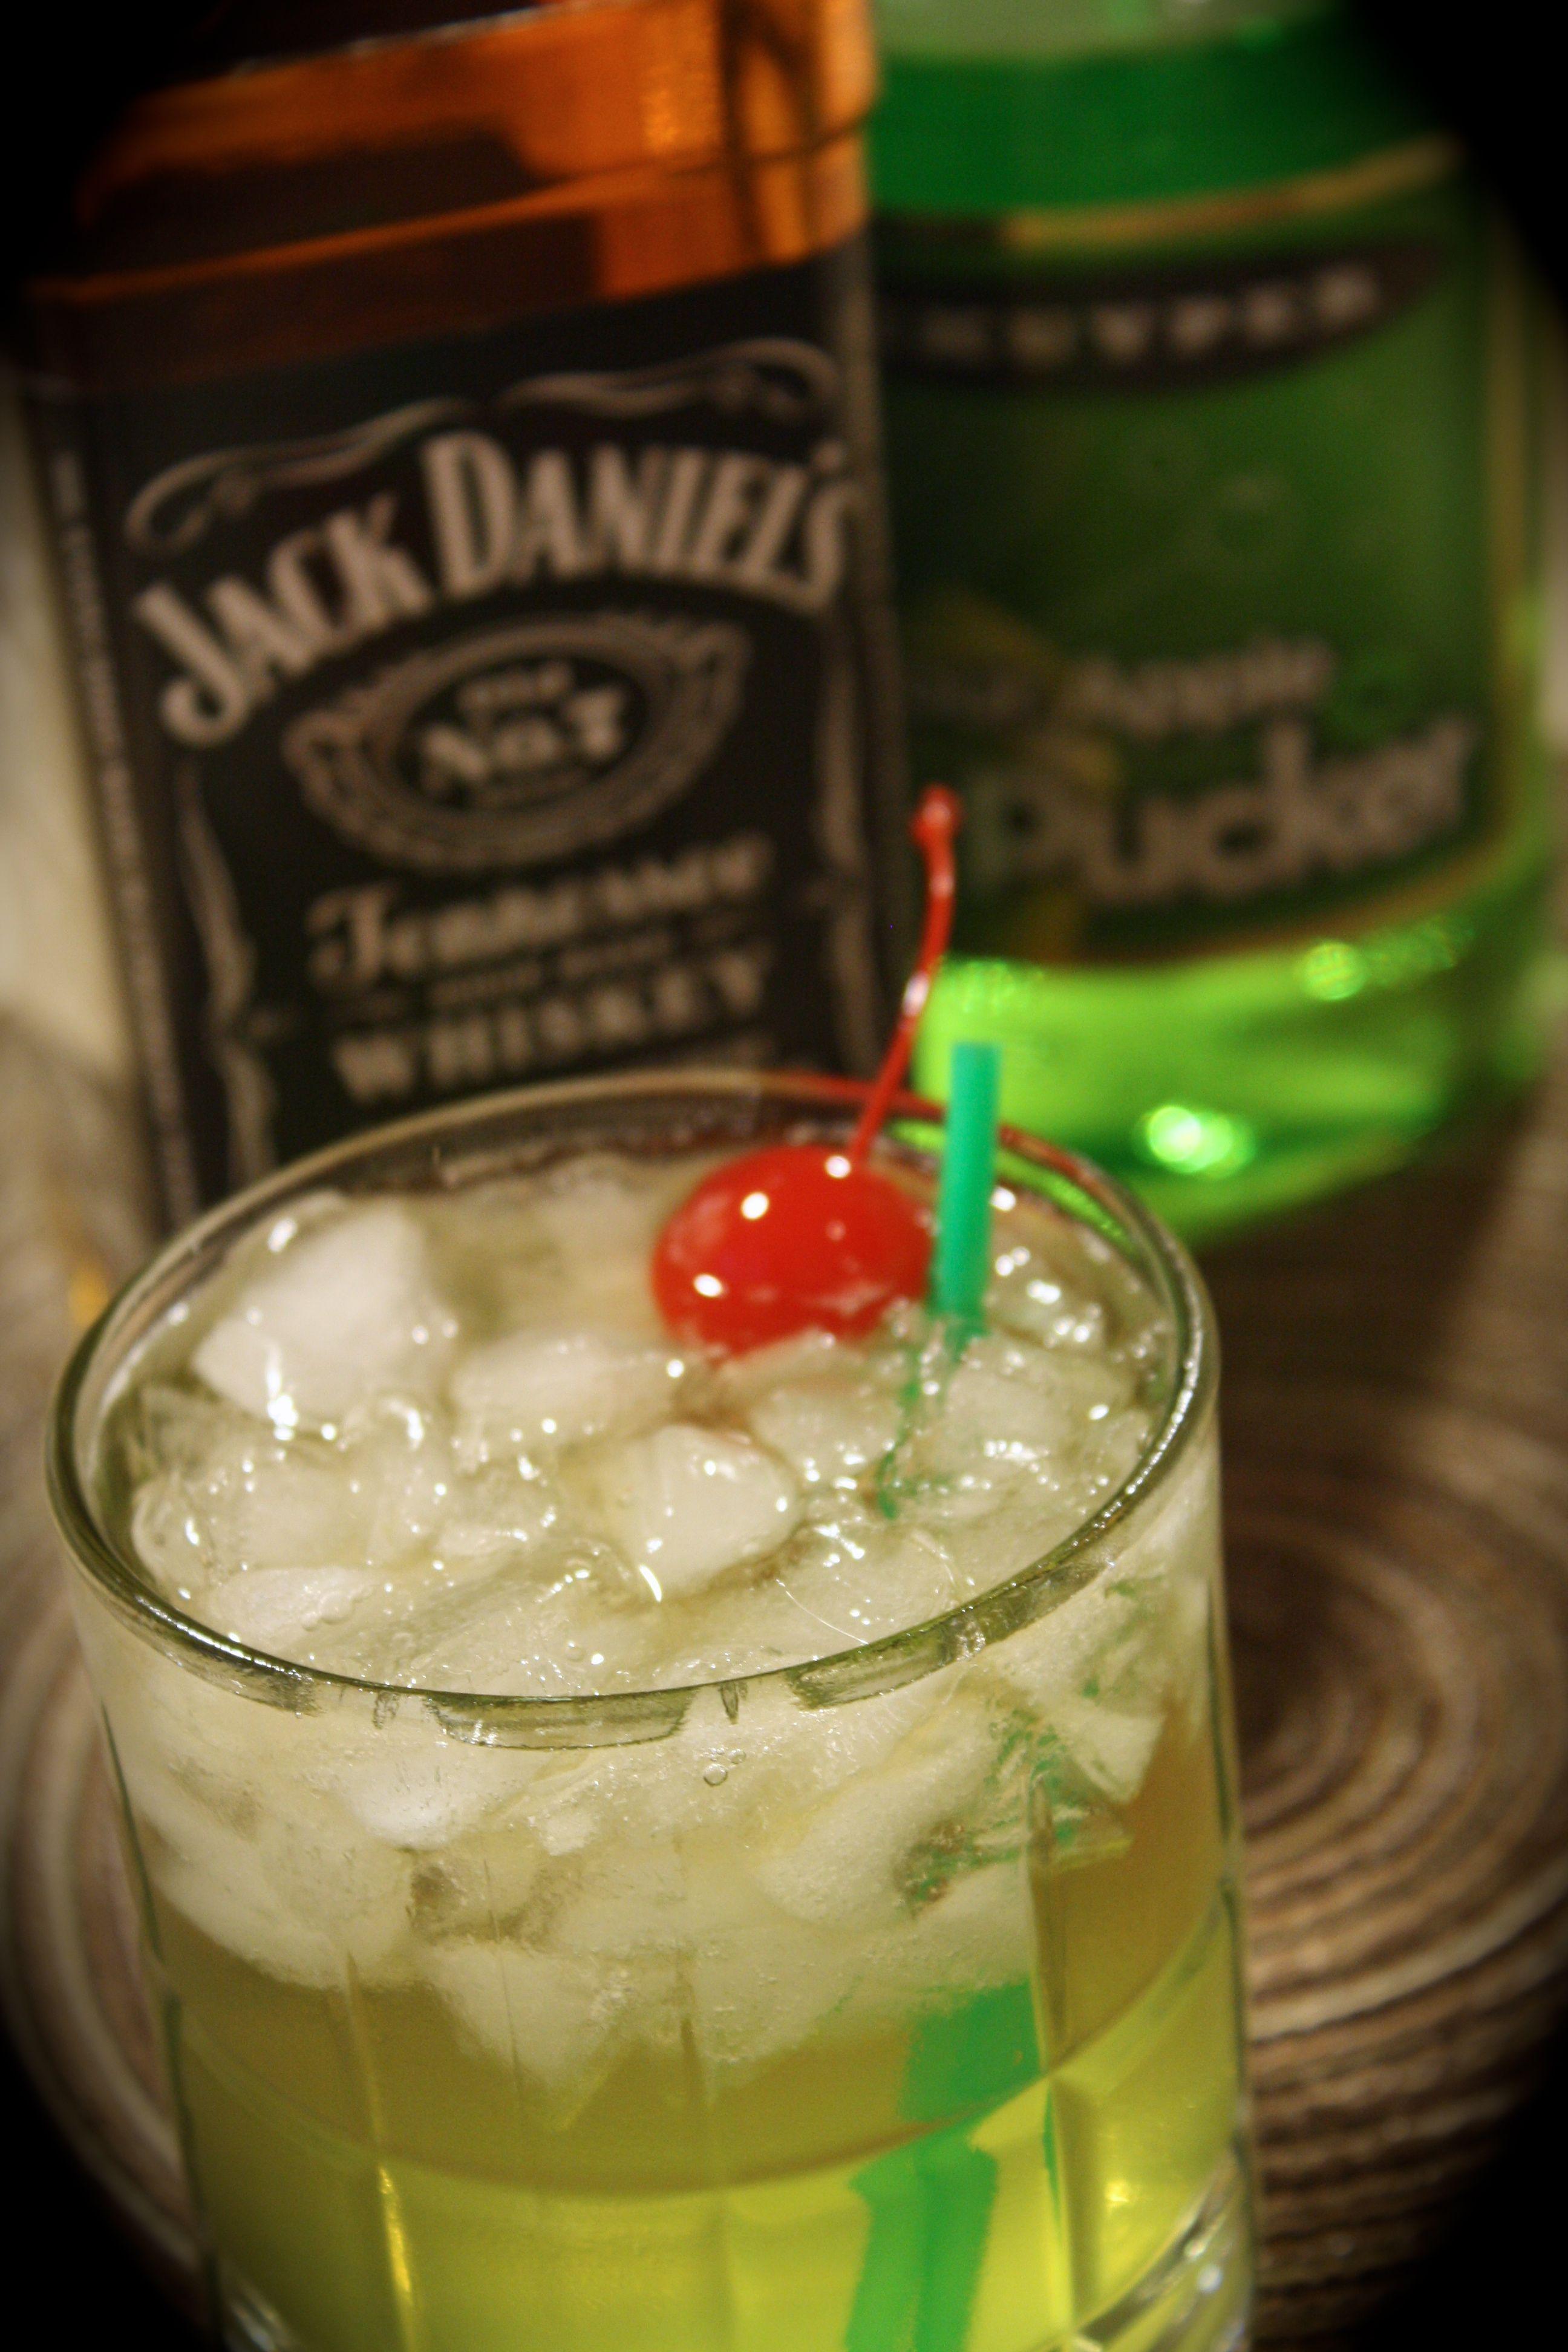 Applejack apple pucker 1oz jack daniels whiskey for Green apple mixed drinks